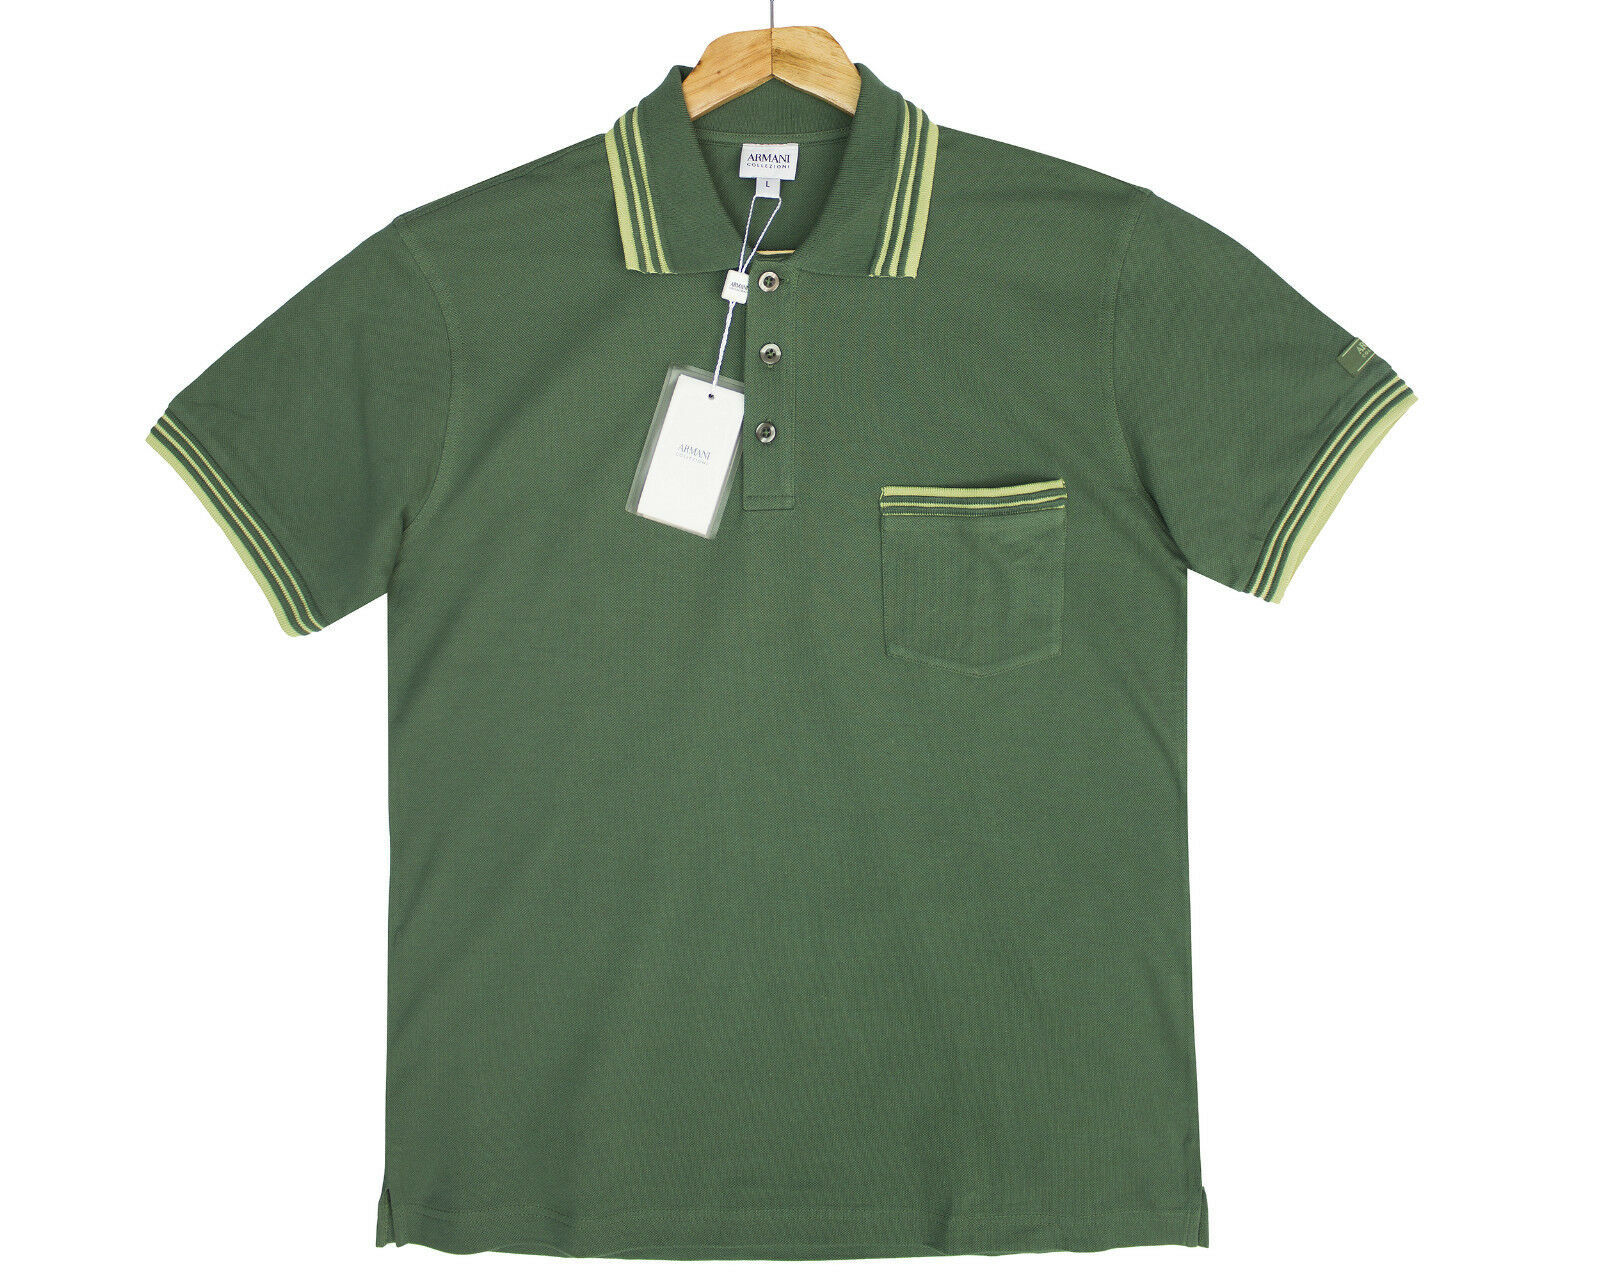 ARMANI COLLEZIONI Verde Polo T Shirt Shirt Shirt dettaglio tasca taglia L 47b554